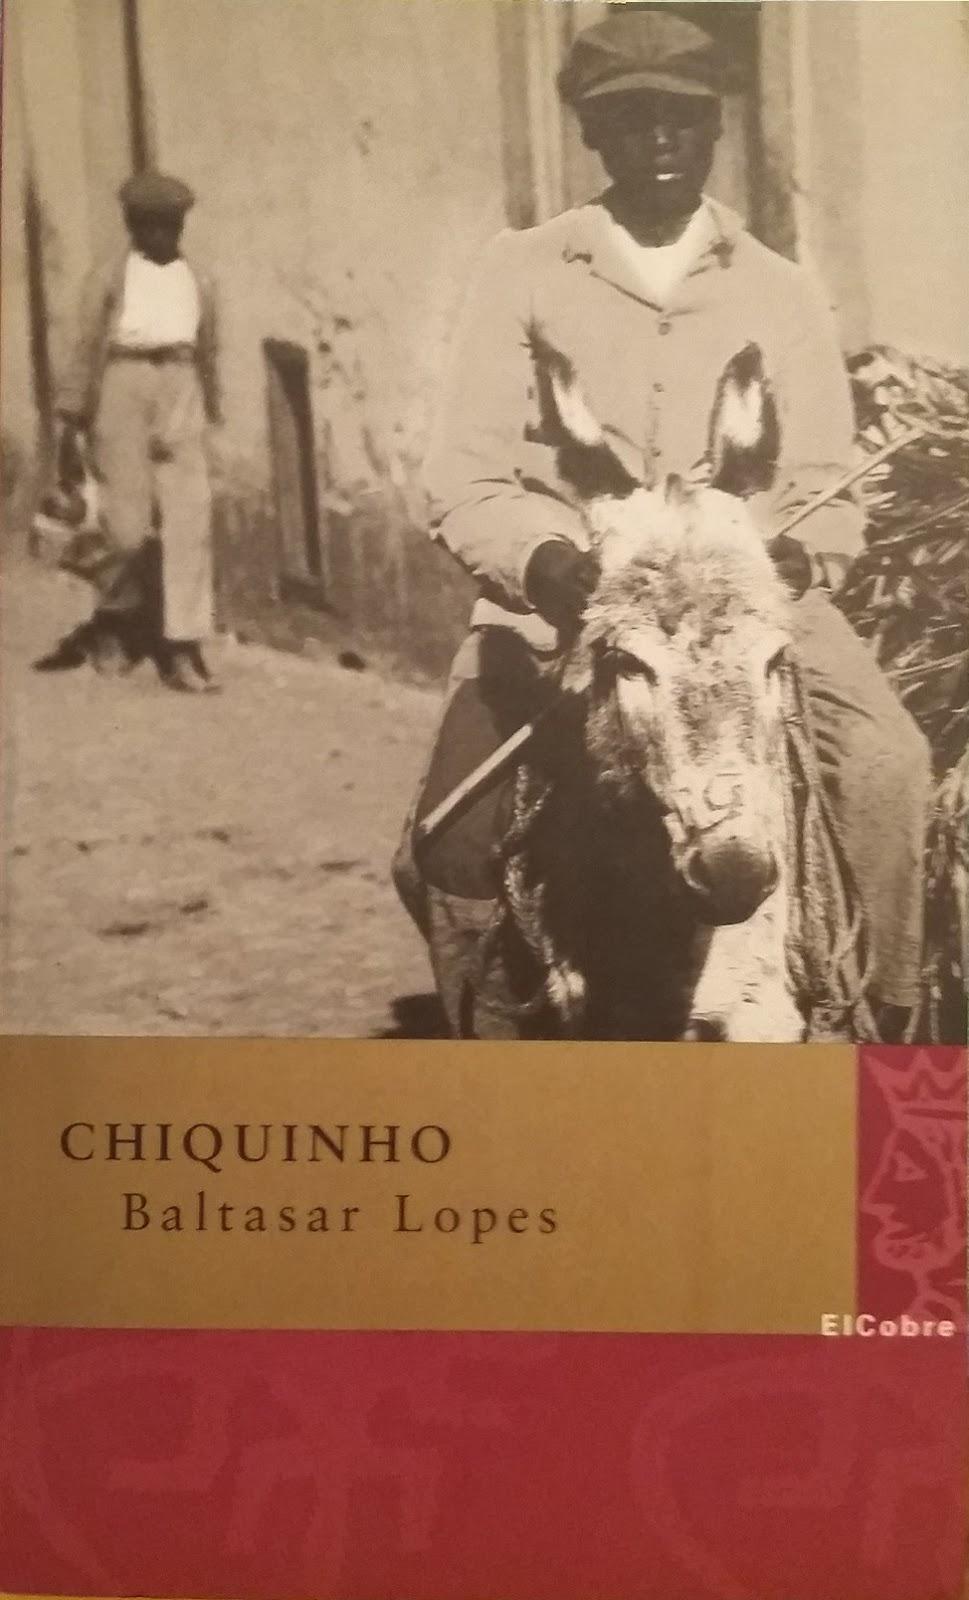 http://laantiguabiblos.blogspot.com.es/2016/10/chiquinho-baltasar-lopes.html